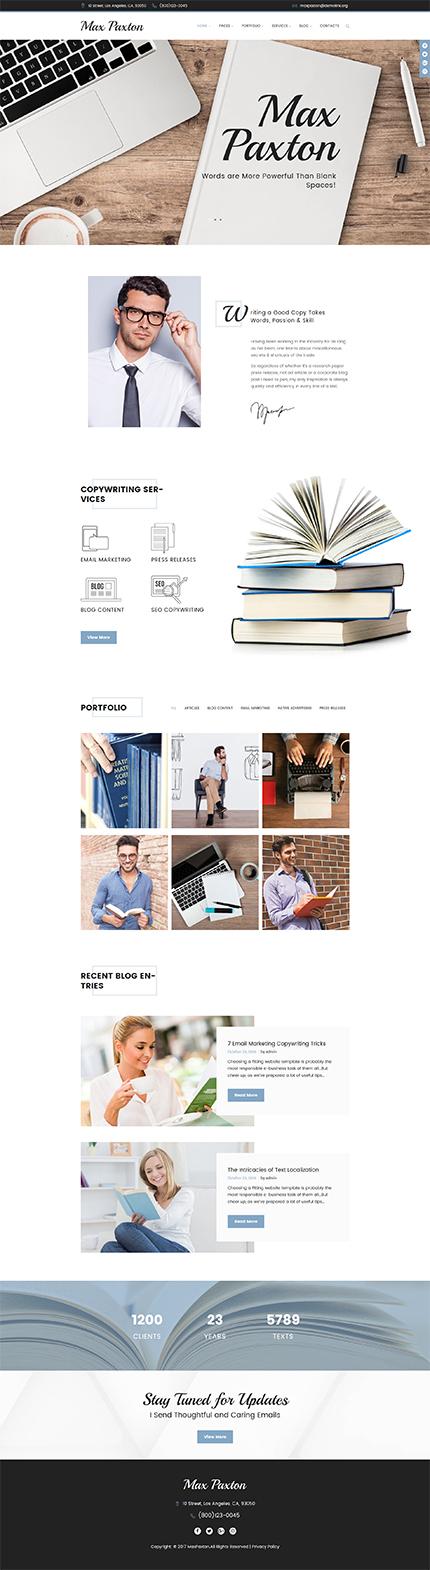 Maxpaxton Freelance Copywriter And Journalist Wordpress Theme Freelance Writing Jobs Writing Jobs Freelance Writing